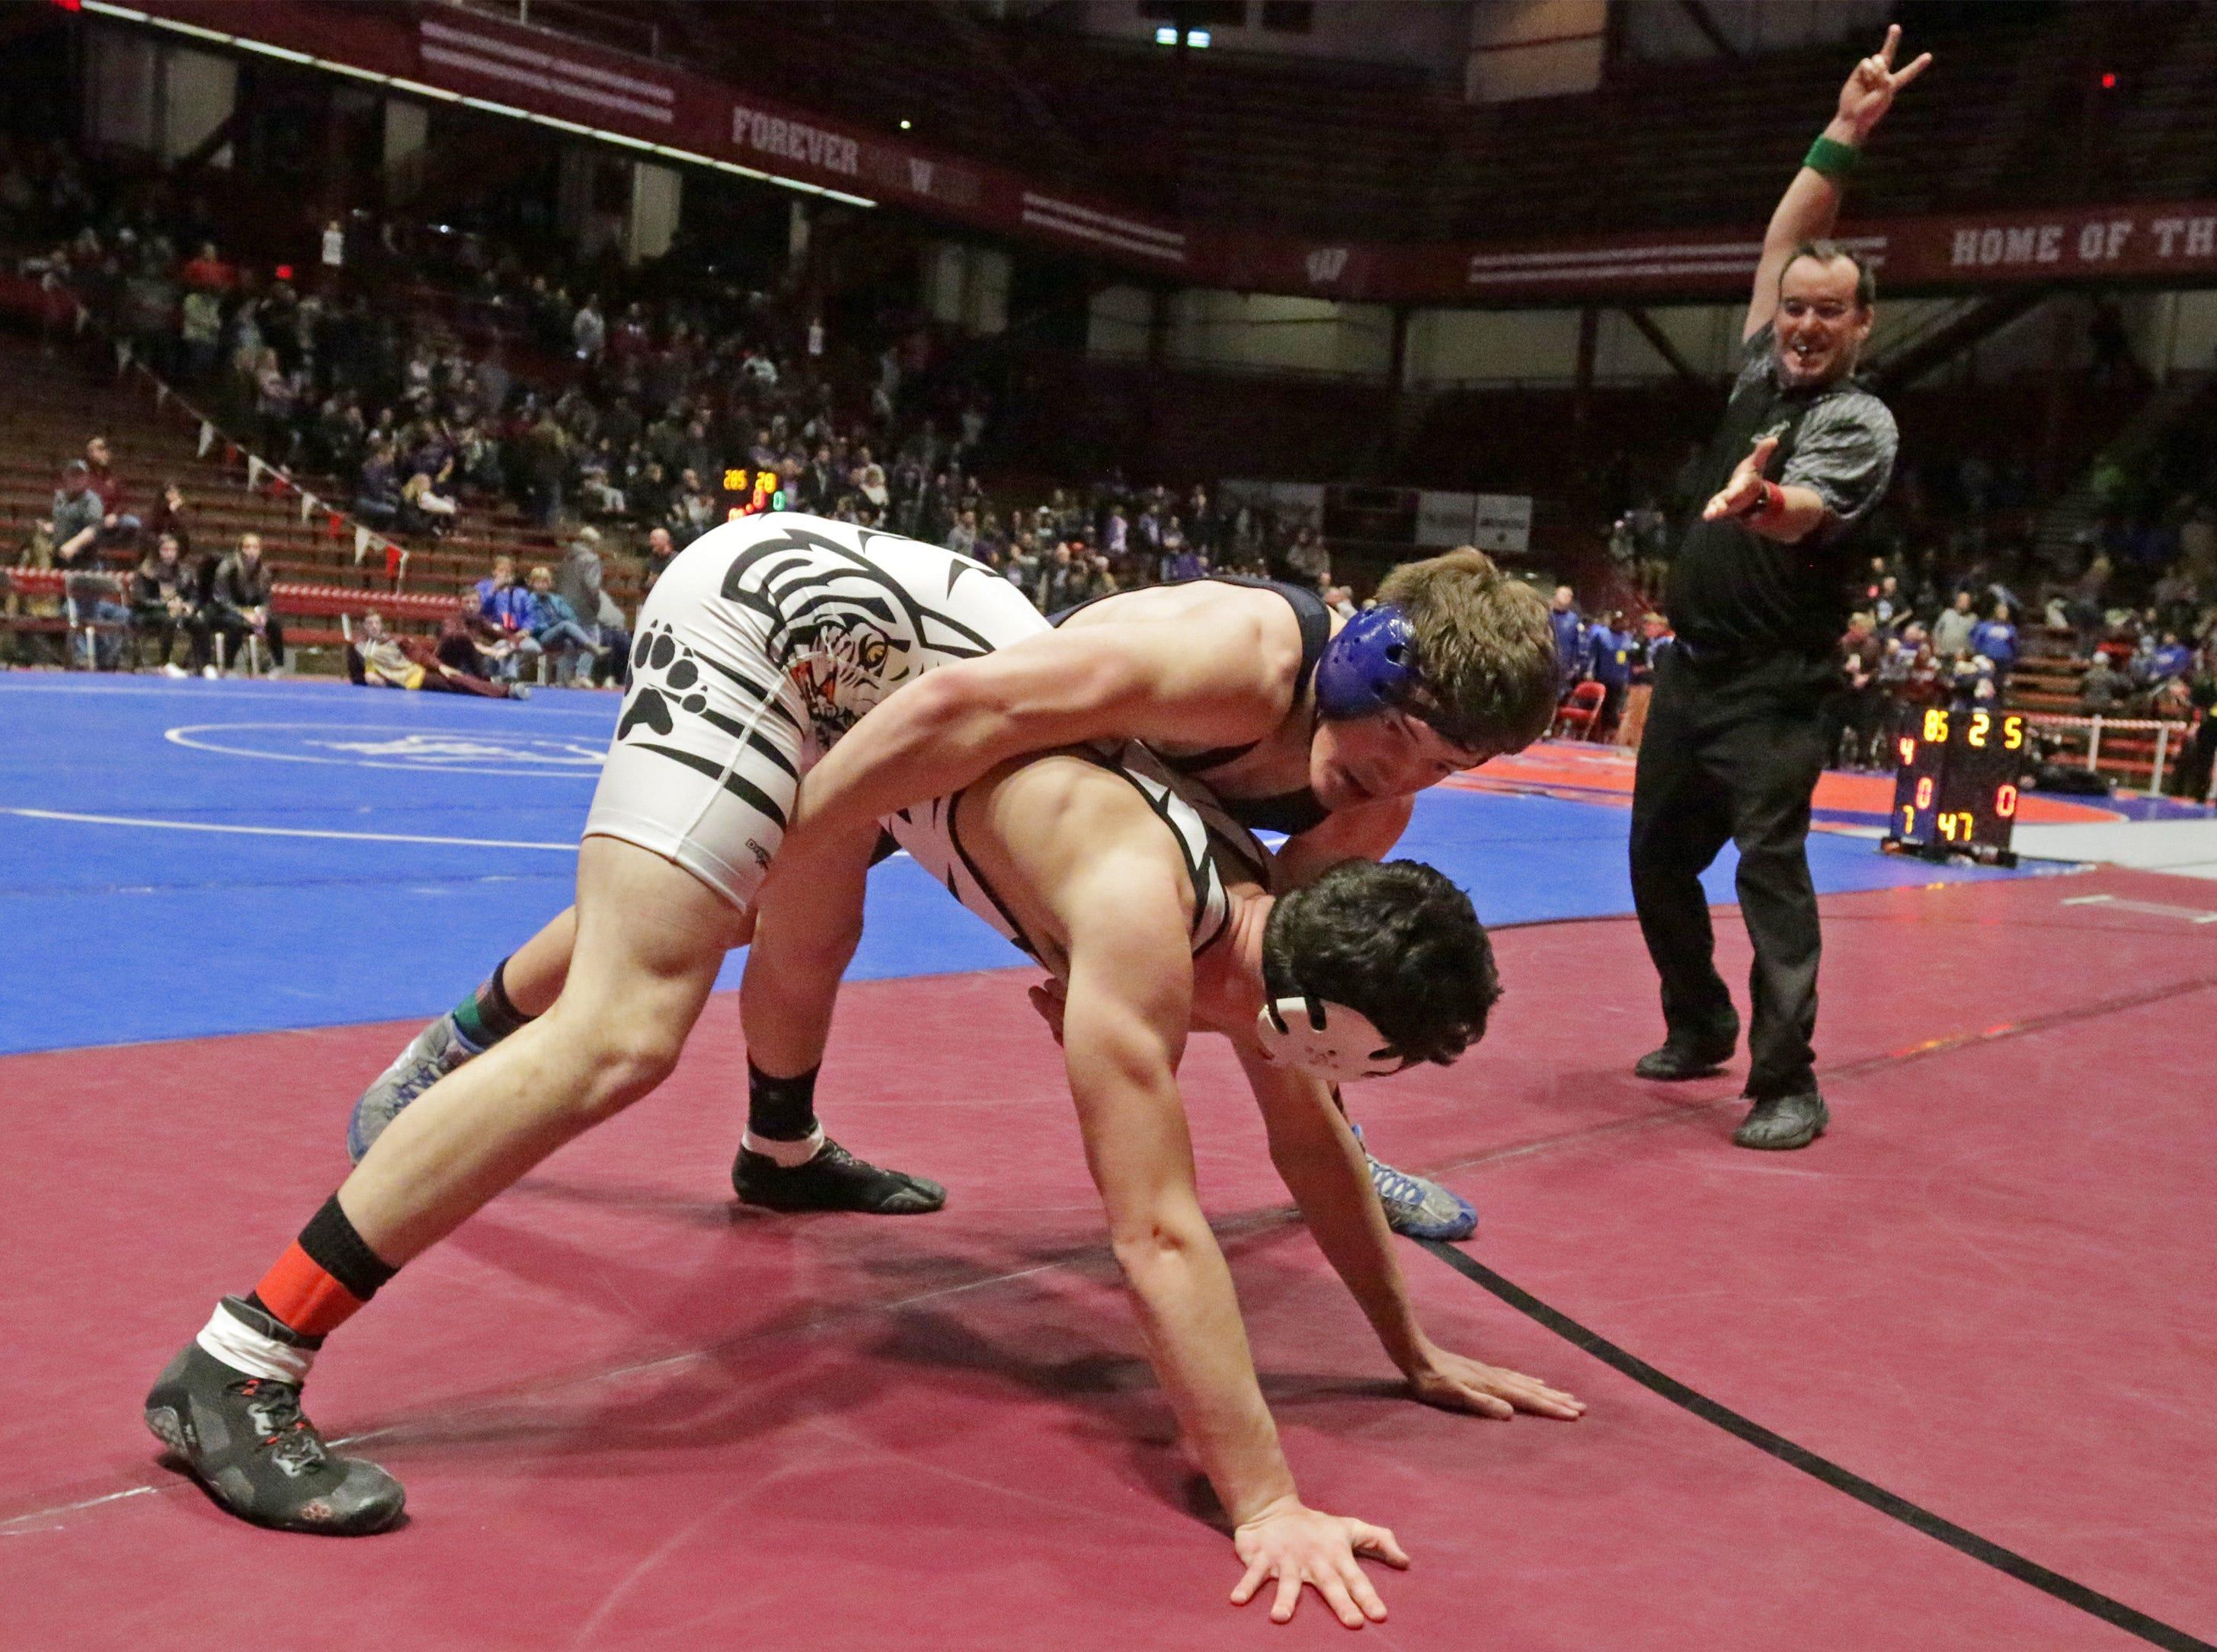 Stratford's Jediah Knetter, bottom, wrestles Random Lake's Brock Upson in a 195-pound match, Saturday, March 2, 2019, in Madison, Wis.